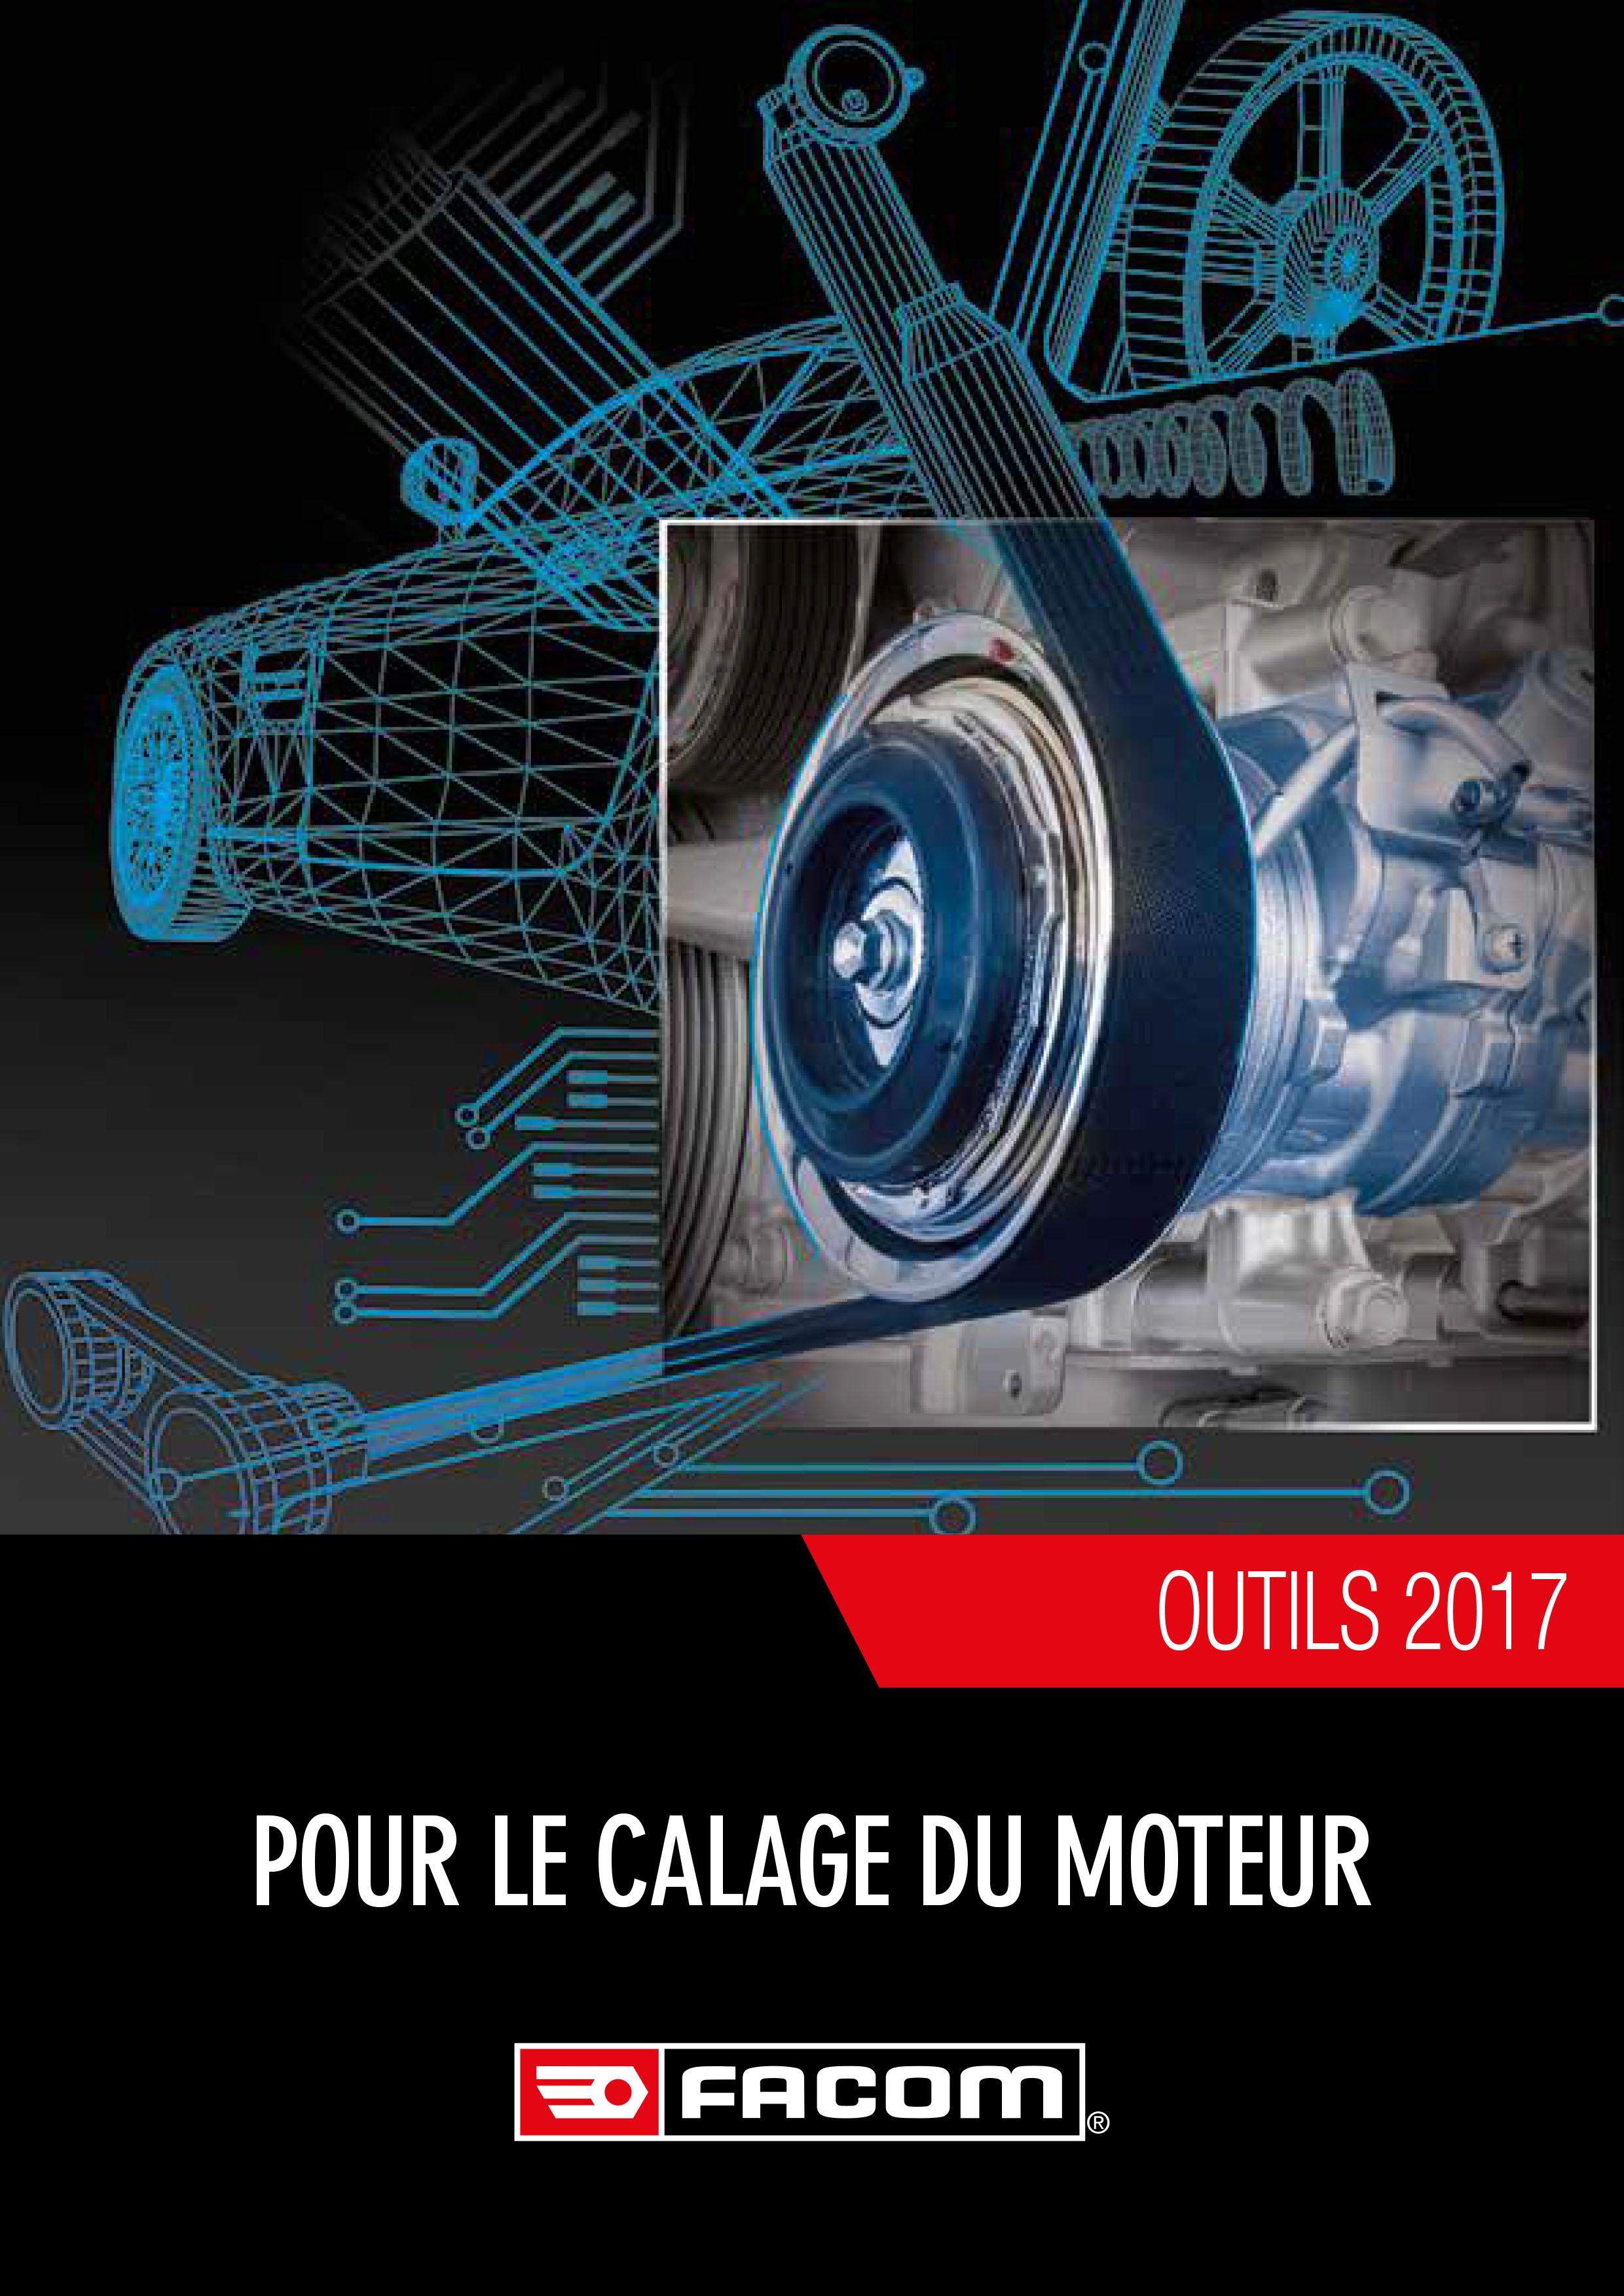 Facom Moteur 2017